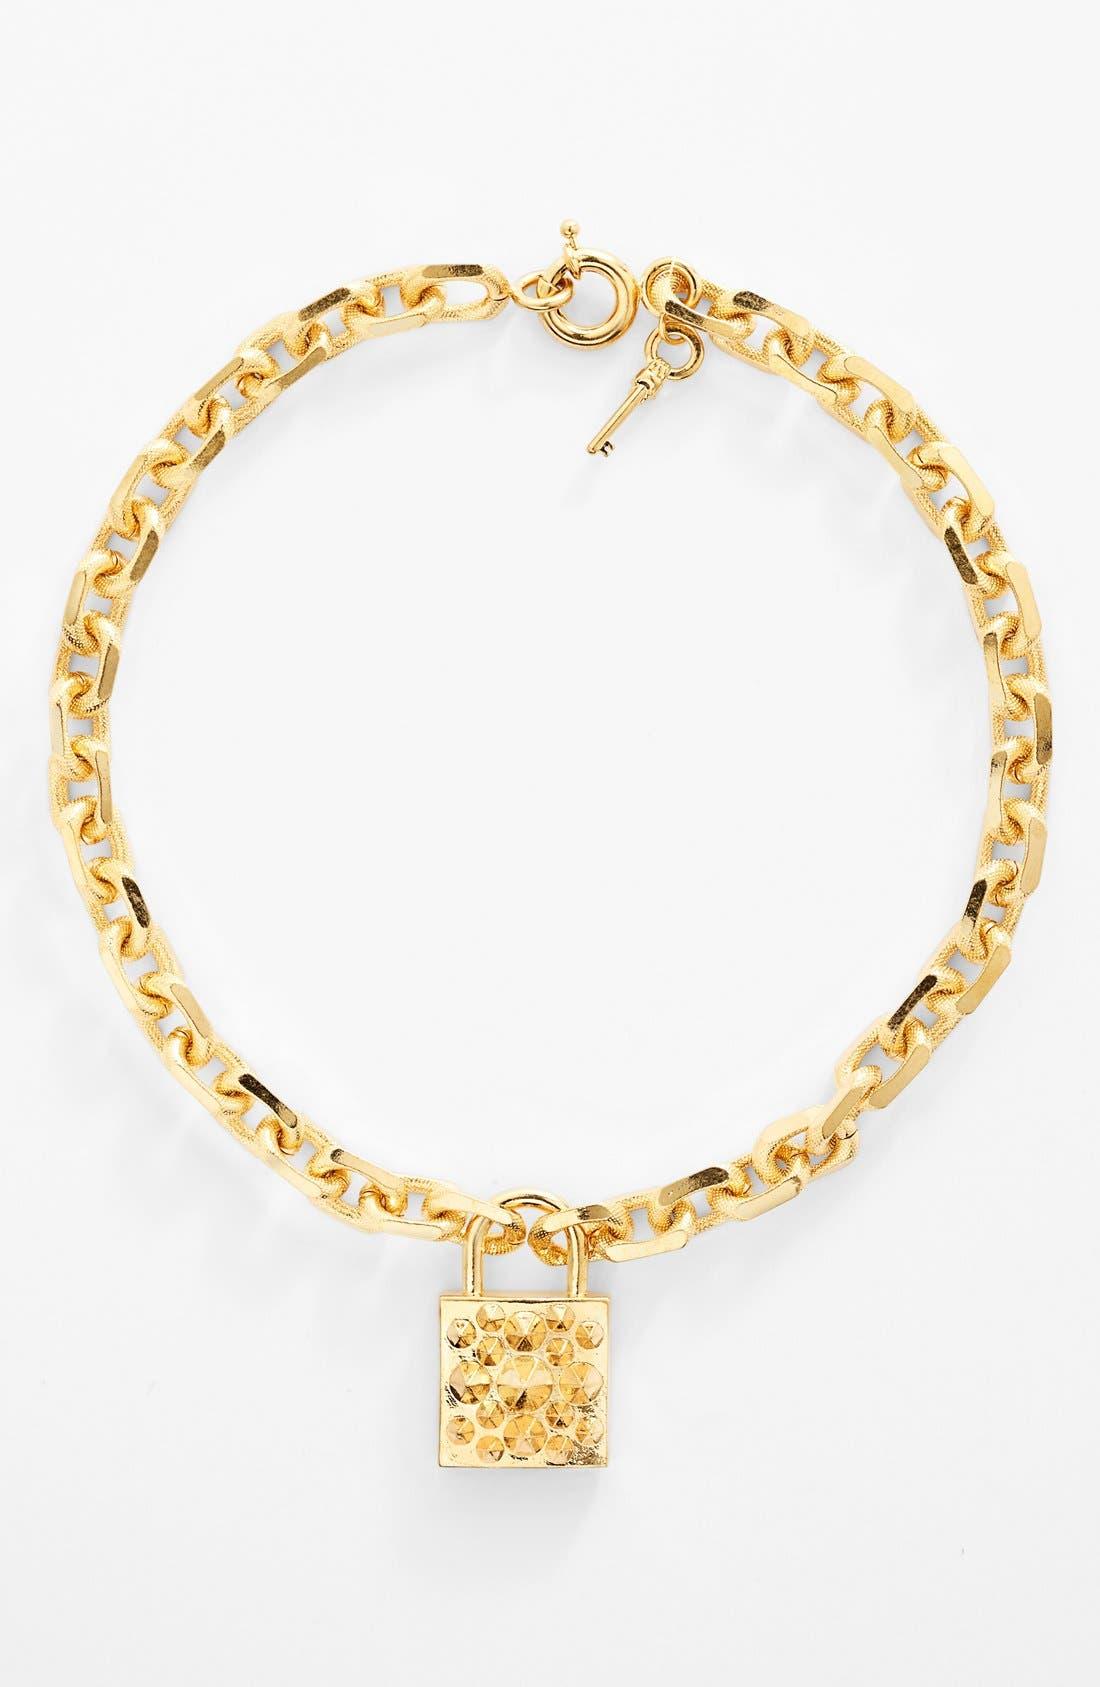 Main Image - Alexander McQueen Padlock & Key Chain Necklace